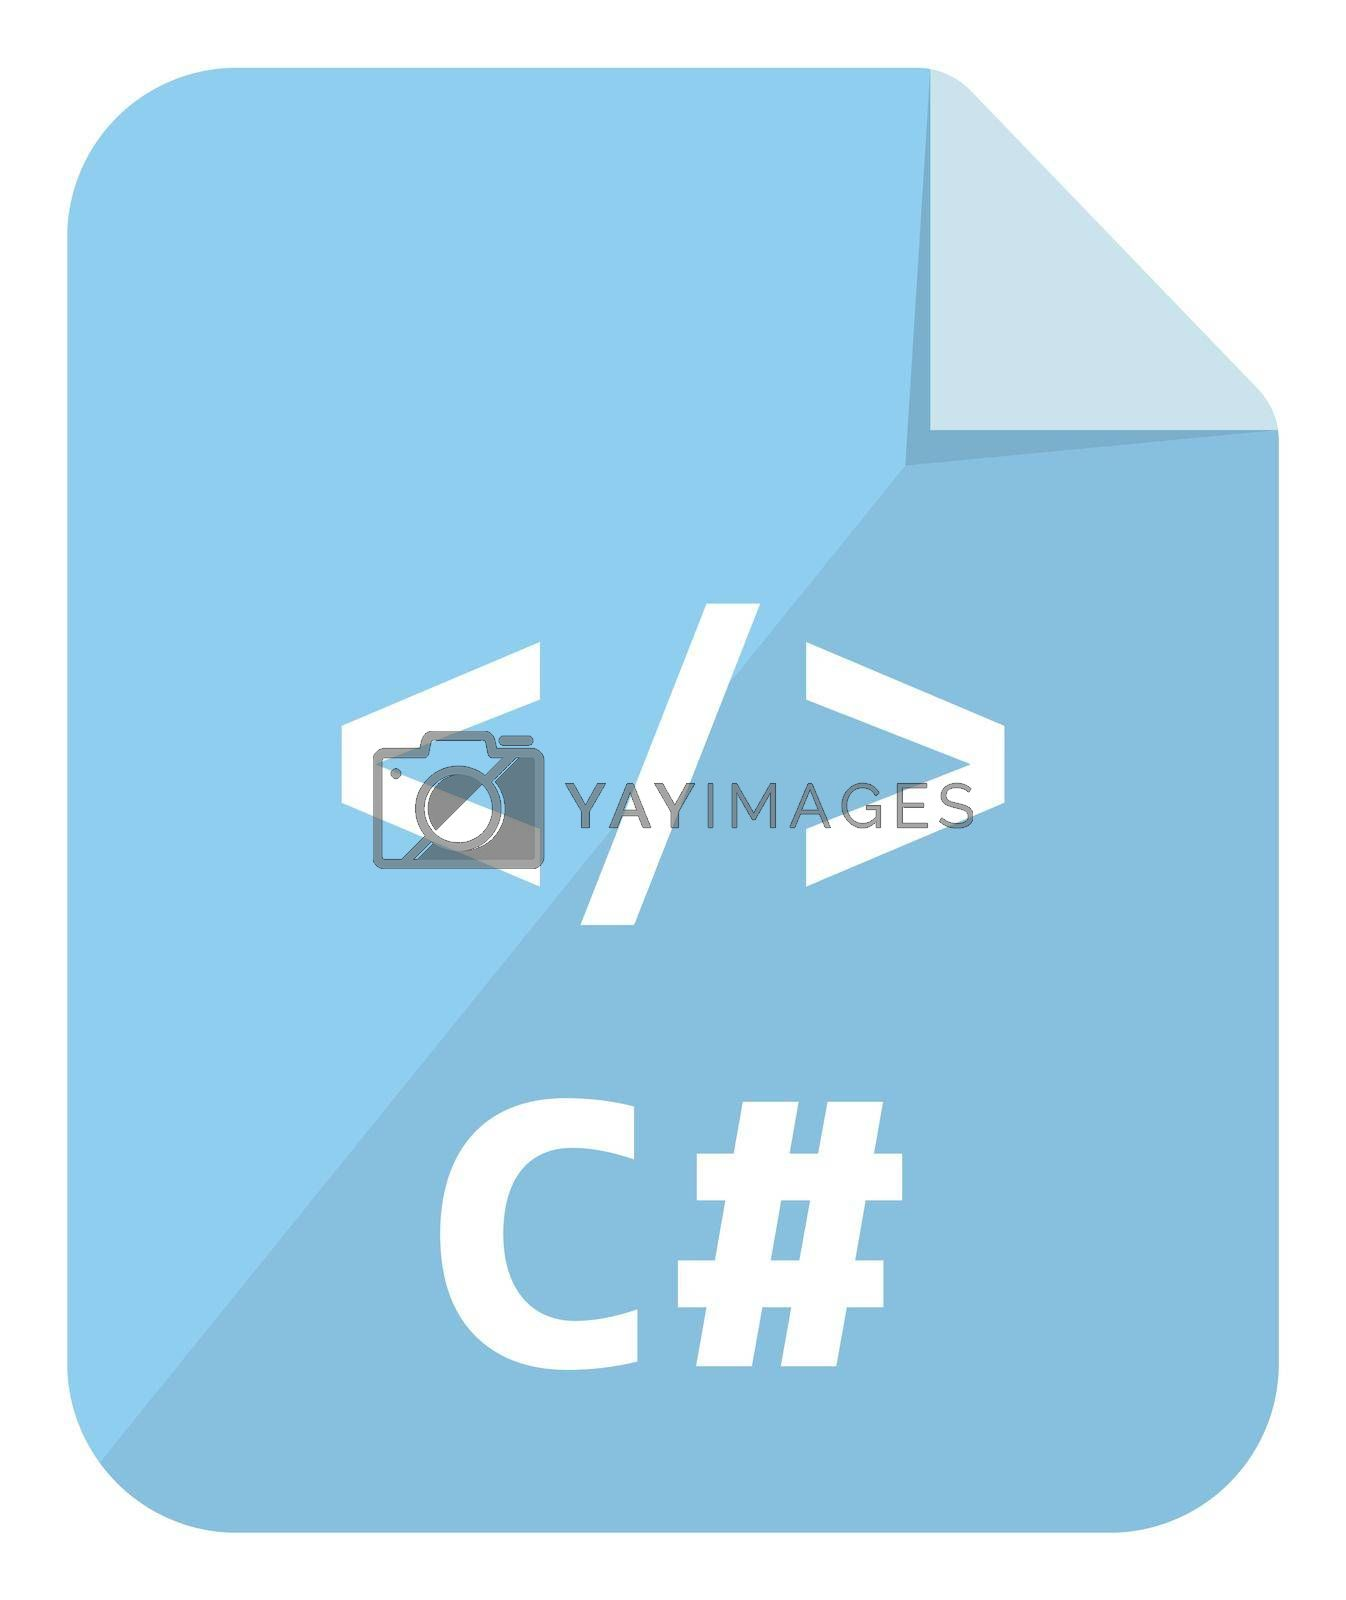 C# icon   Major programming language vector icon illustration  ( color version )